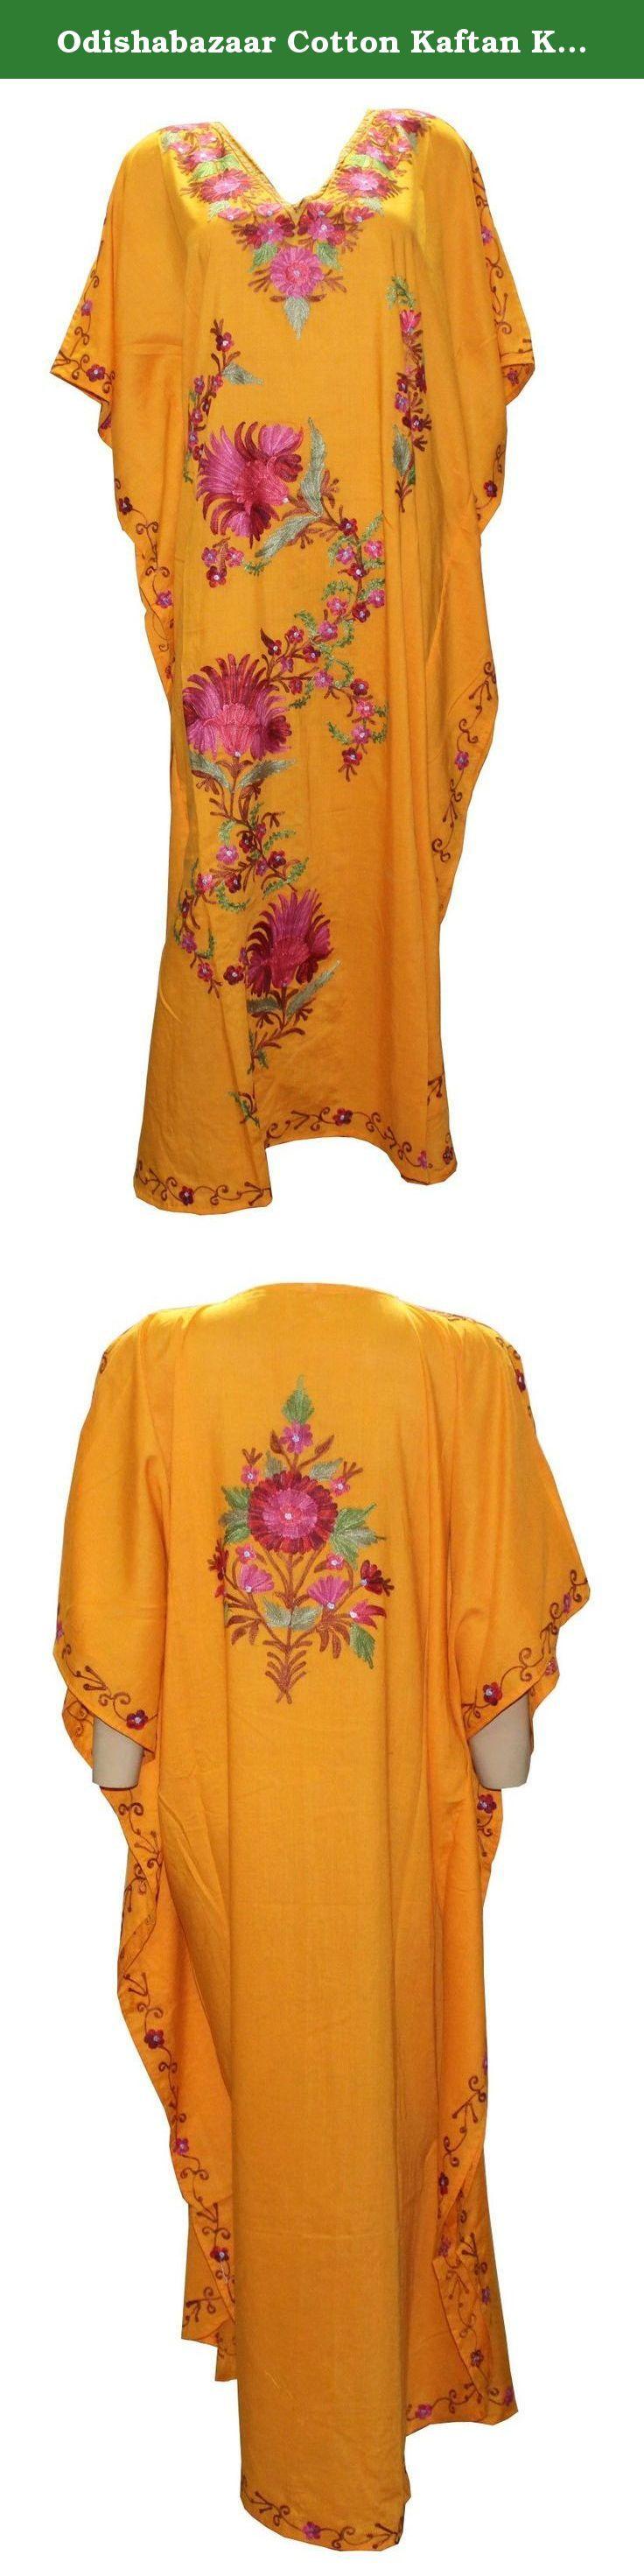 Odishabazaar Cotton Kaftan Kashmiri Embroidered Maxi Long Dress for Women (multi-9). Long length Kashmiri Kaftan/lounge wear/beach wear/ maxi dress with Ari Embroidered Flowers.